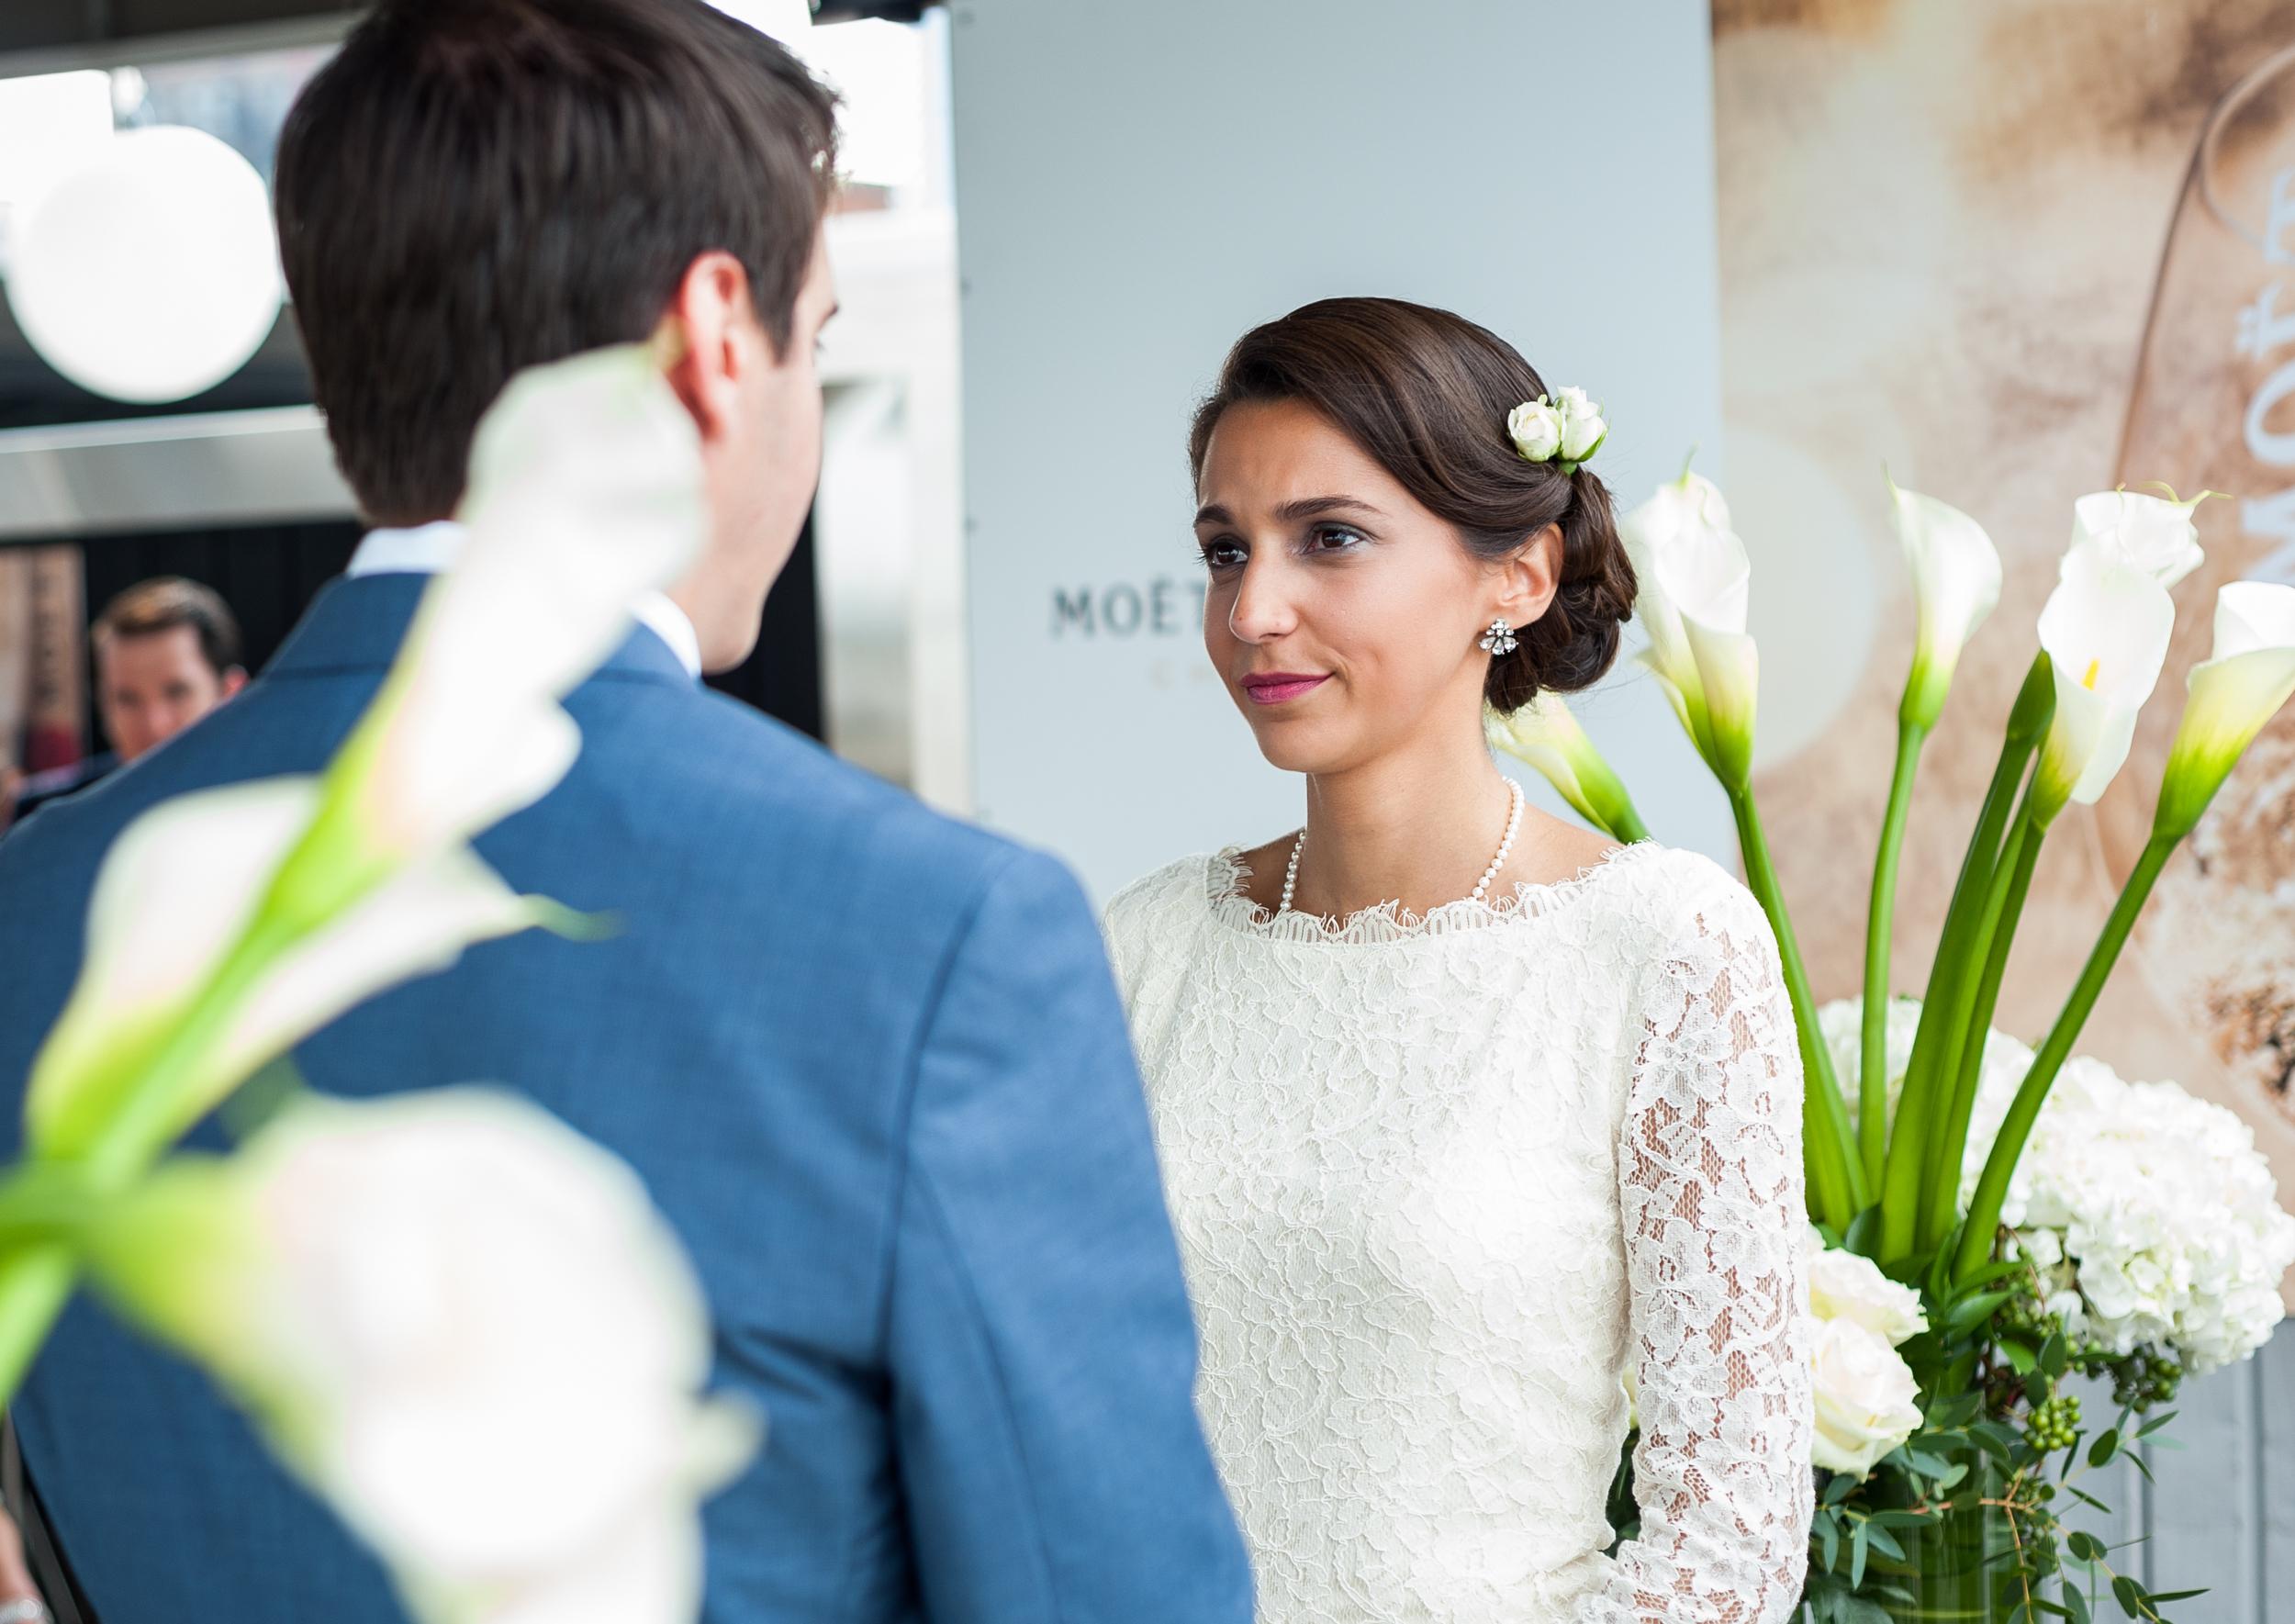 Wedding (12 of 17).JPG